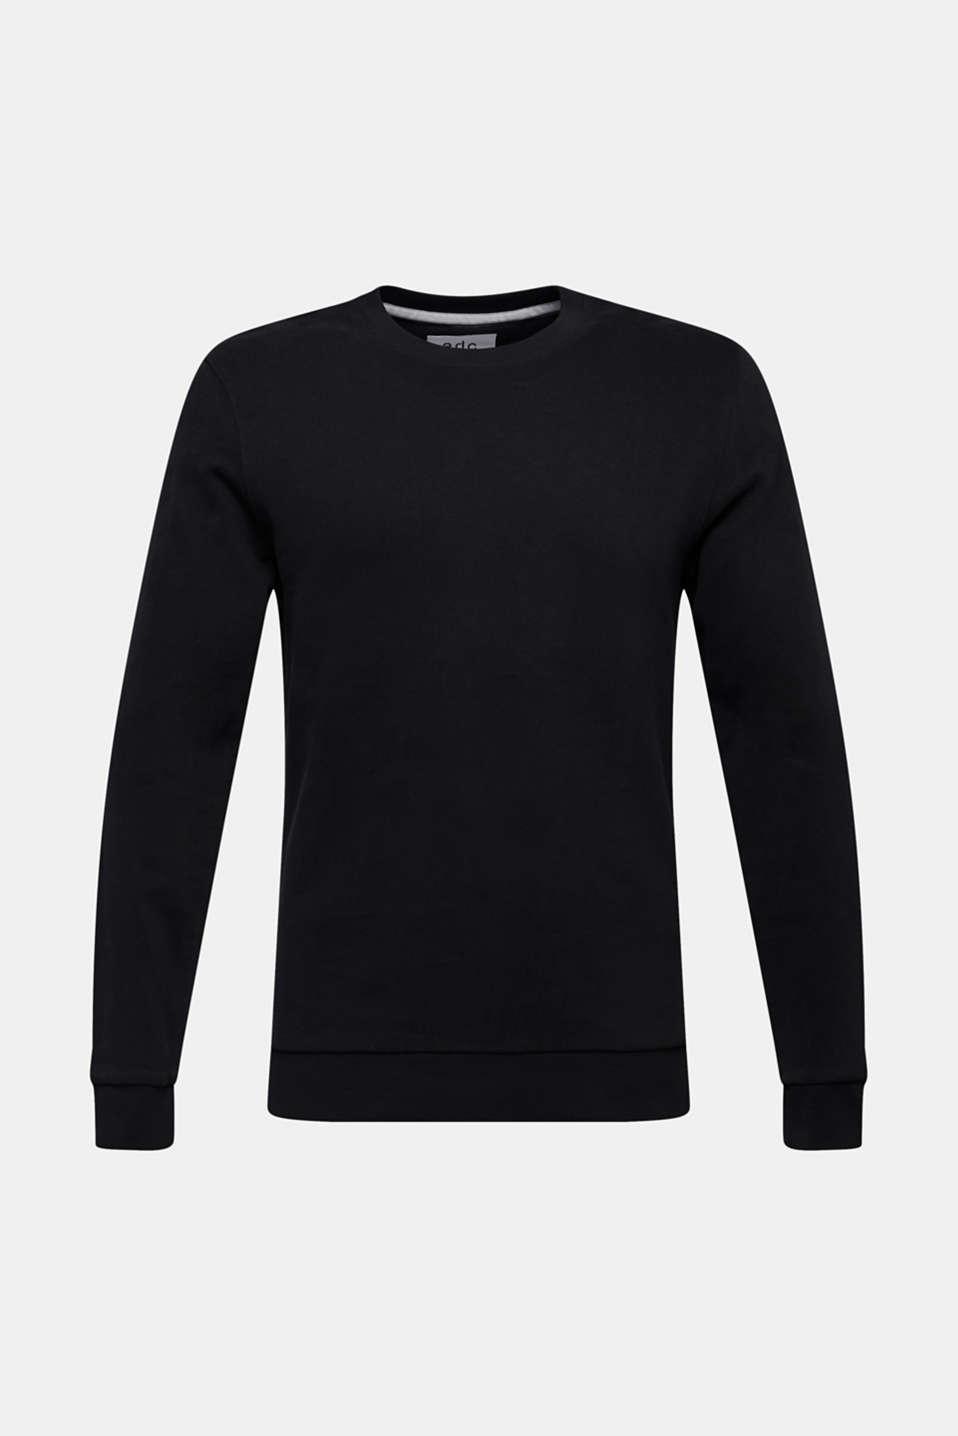 Sweatshirt in 100% cotton, BLACK, detail image number 6